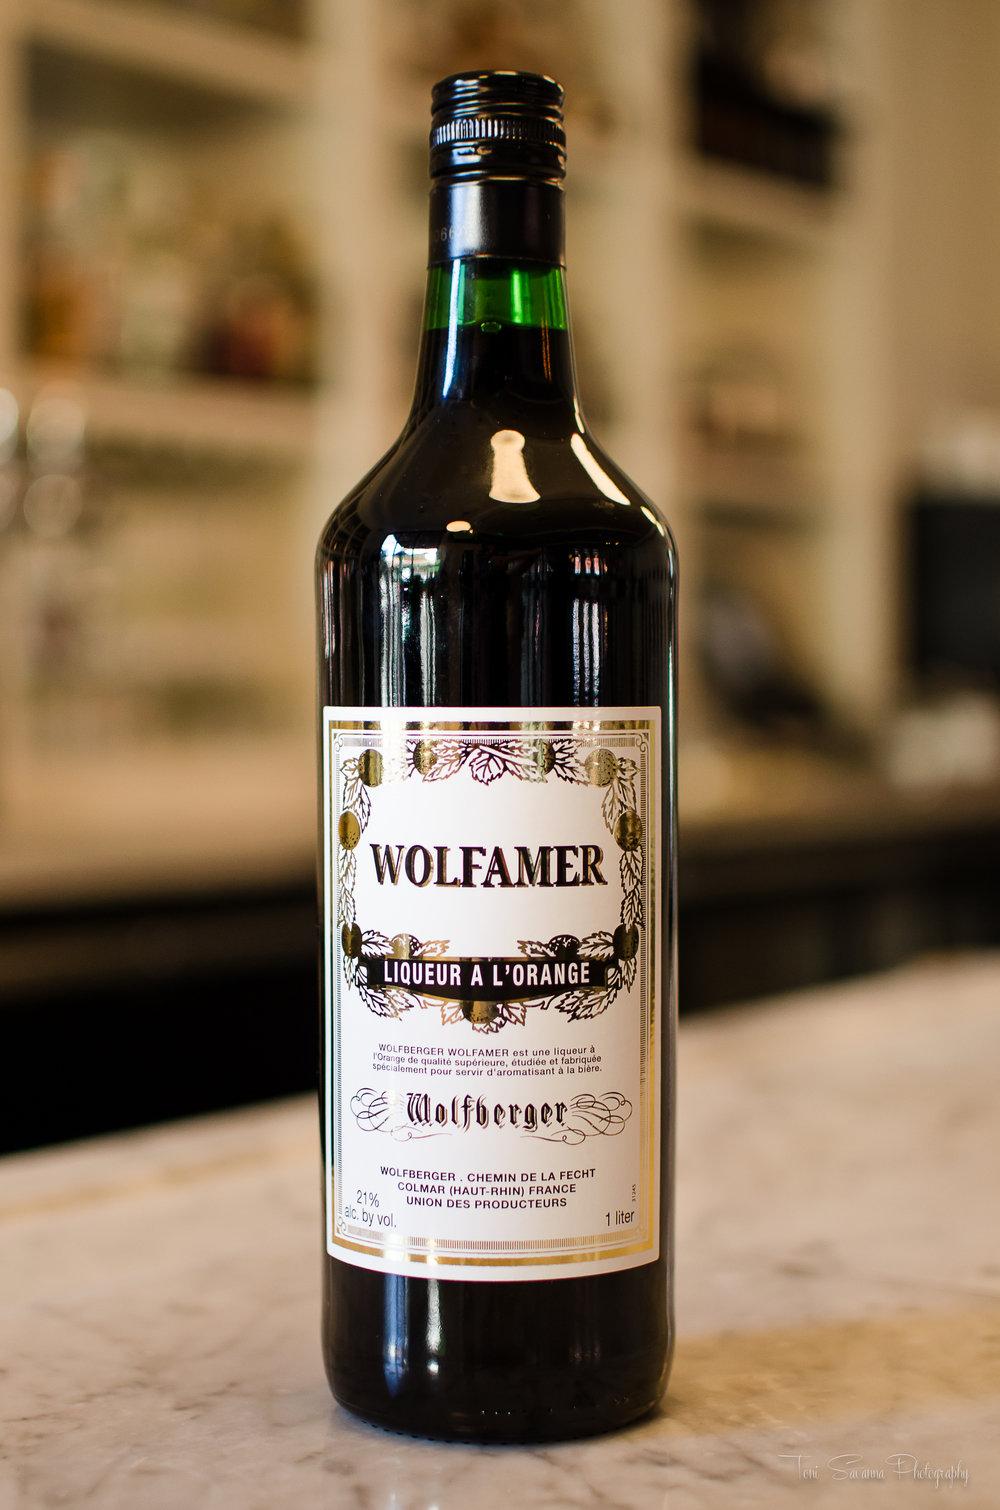 Wolfberger Wolfamer Bottle shot.